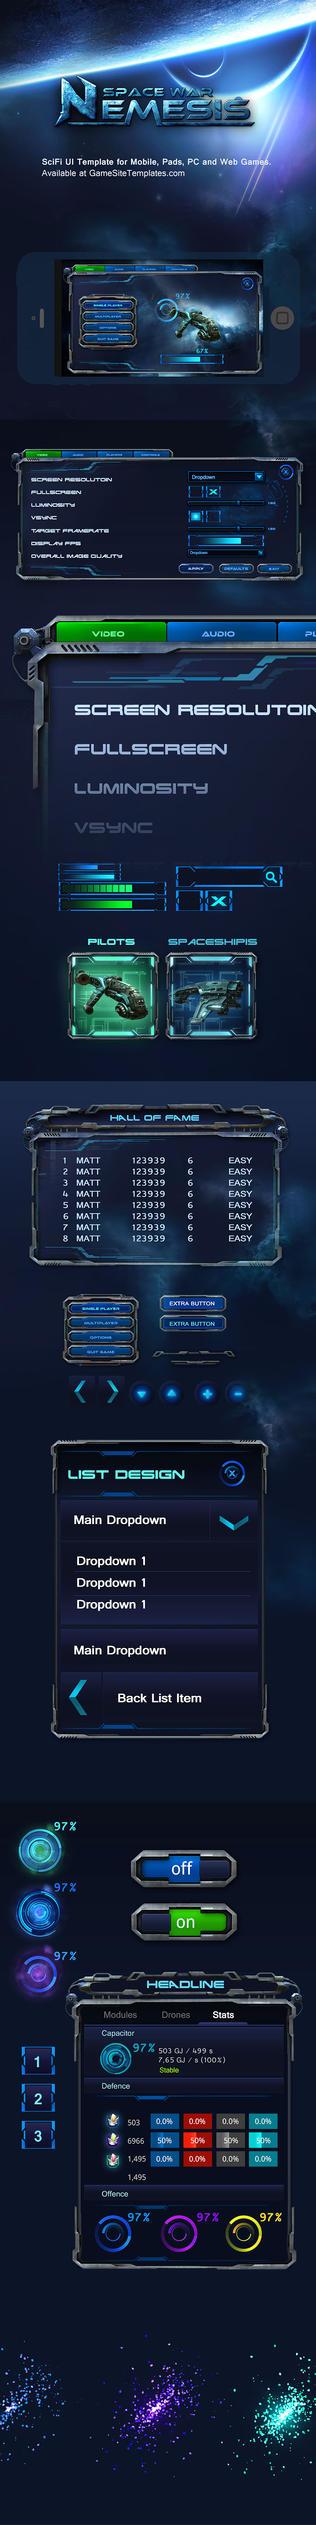 SpaceWar-SciFi-Mobile-Game-GUI-Interface-04 by karsten